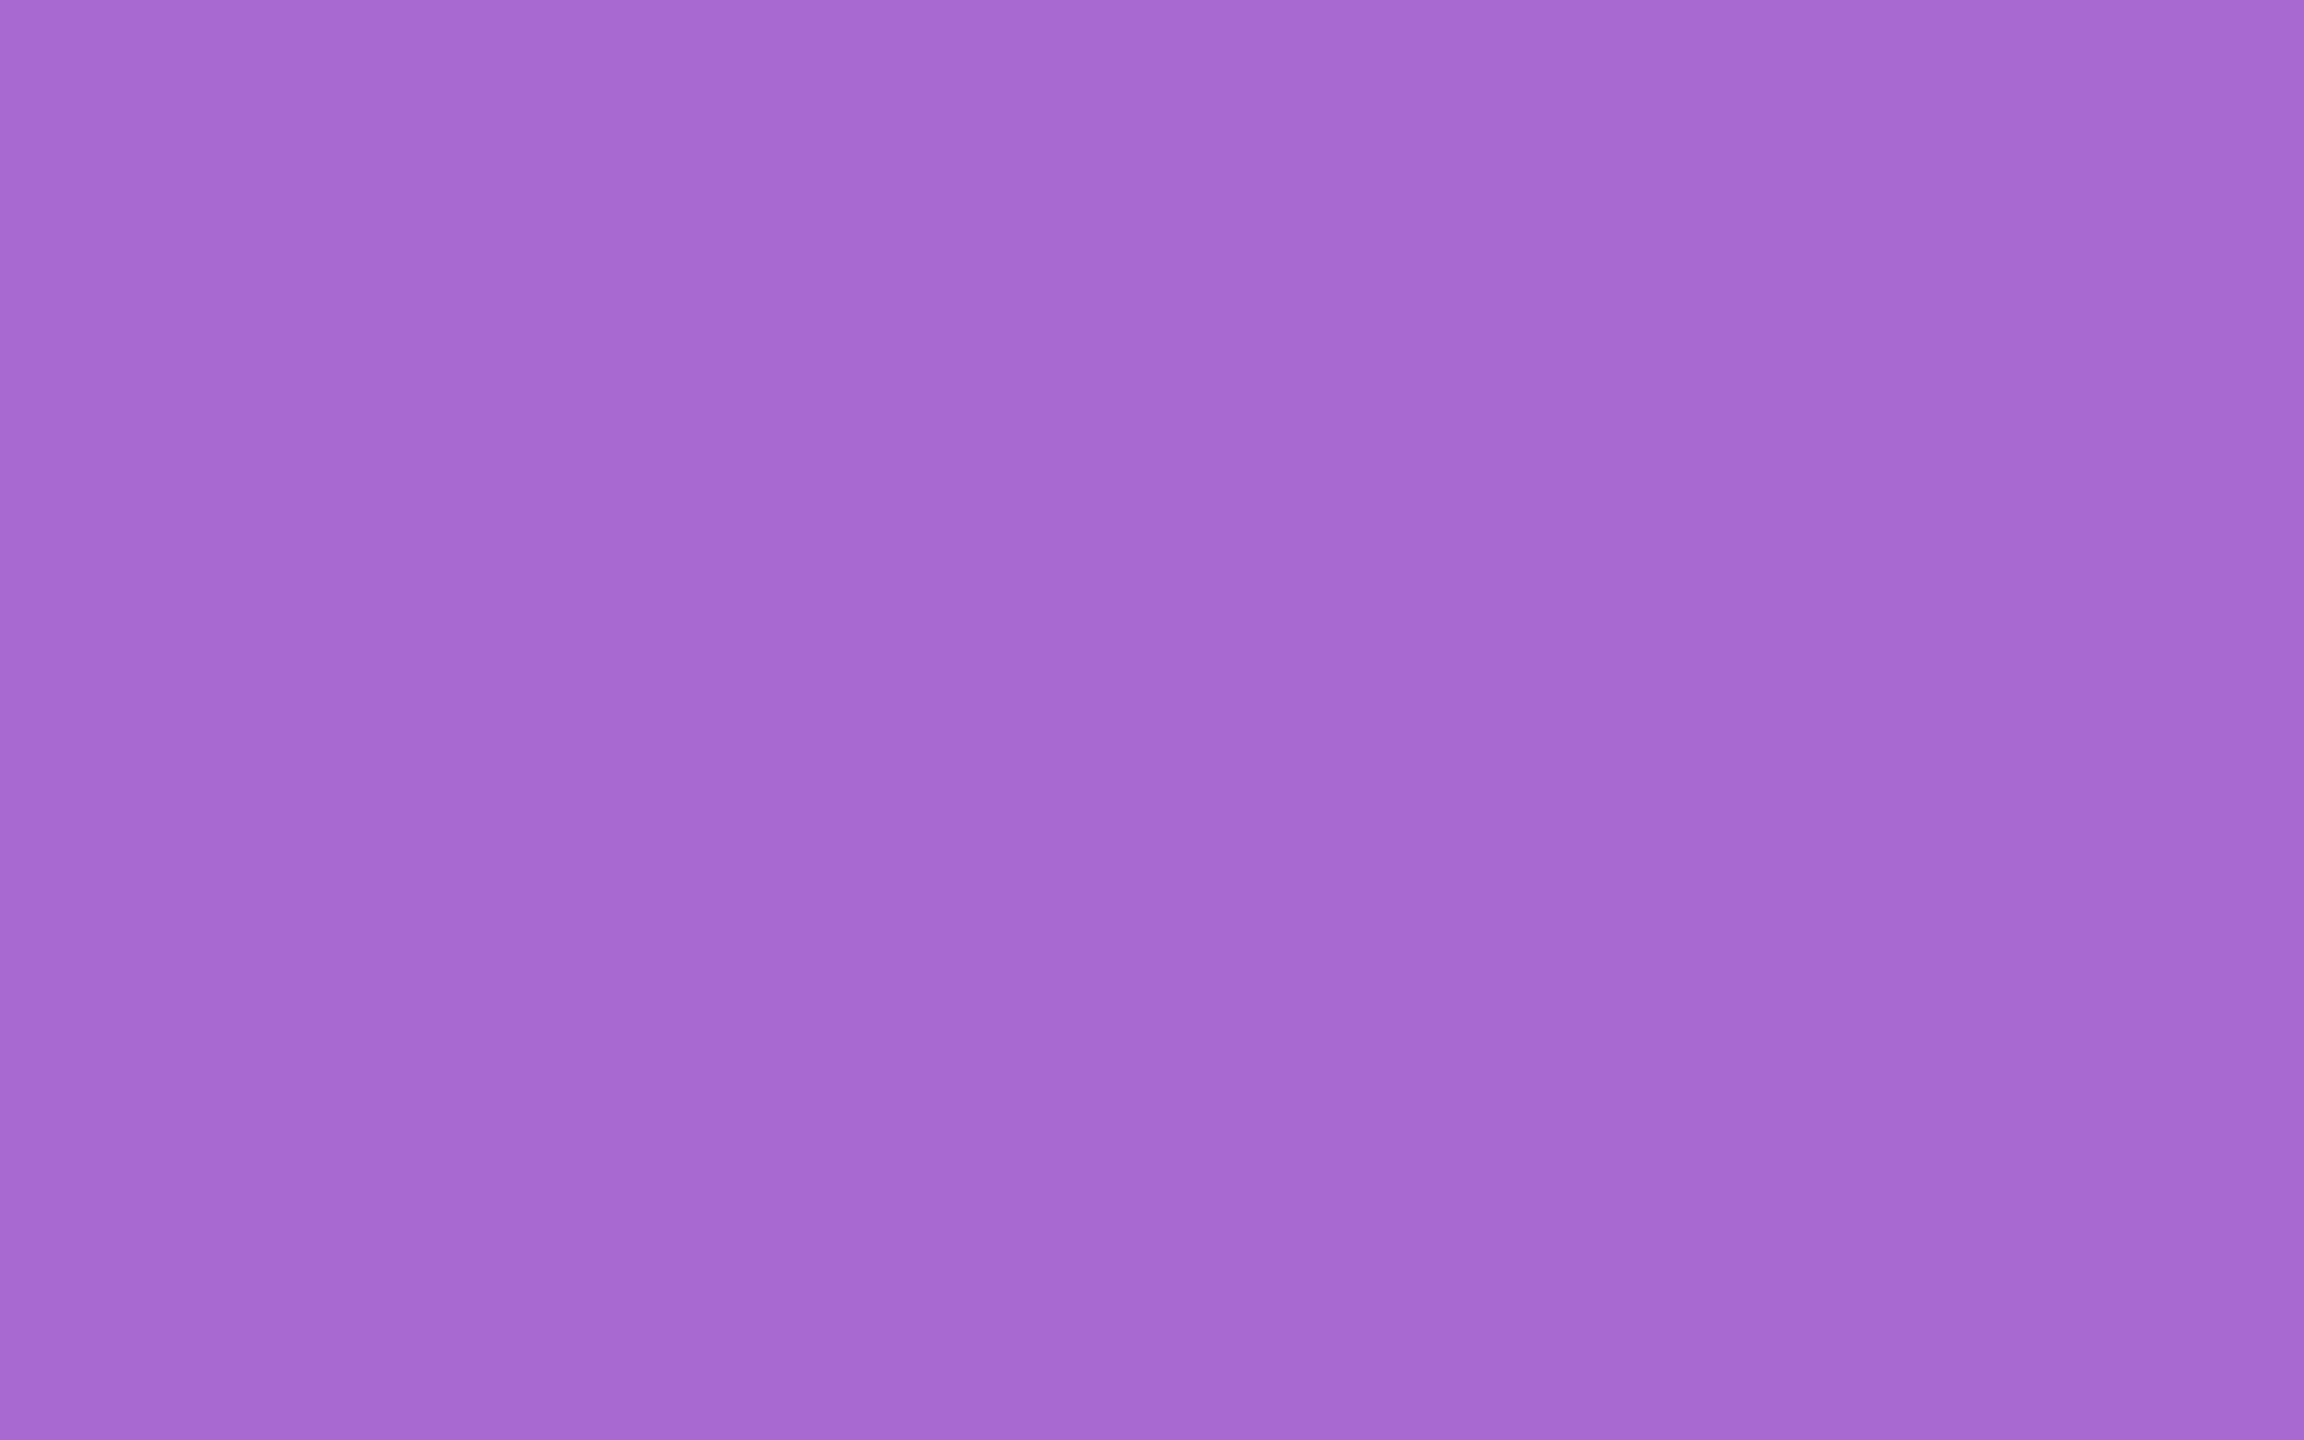 2304x1440 Rich Lavender Solid Color Background